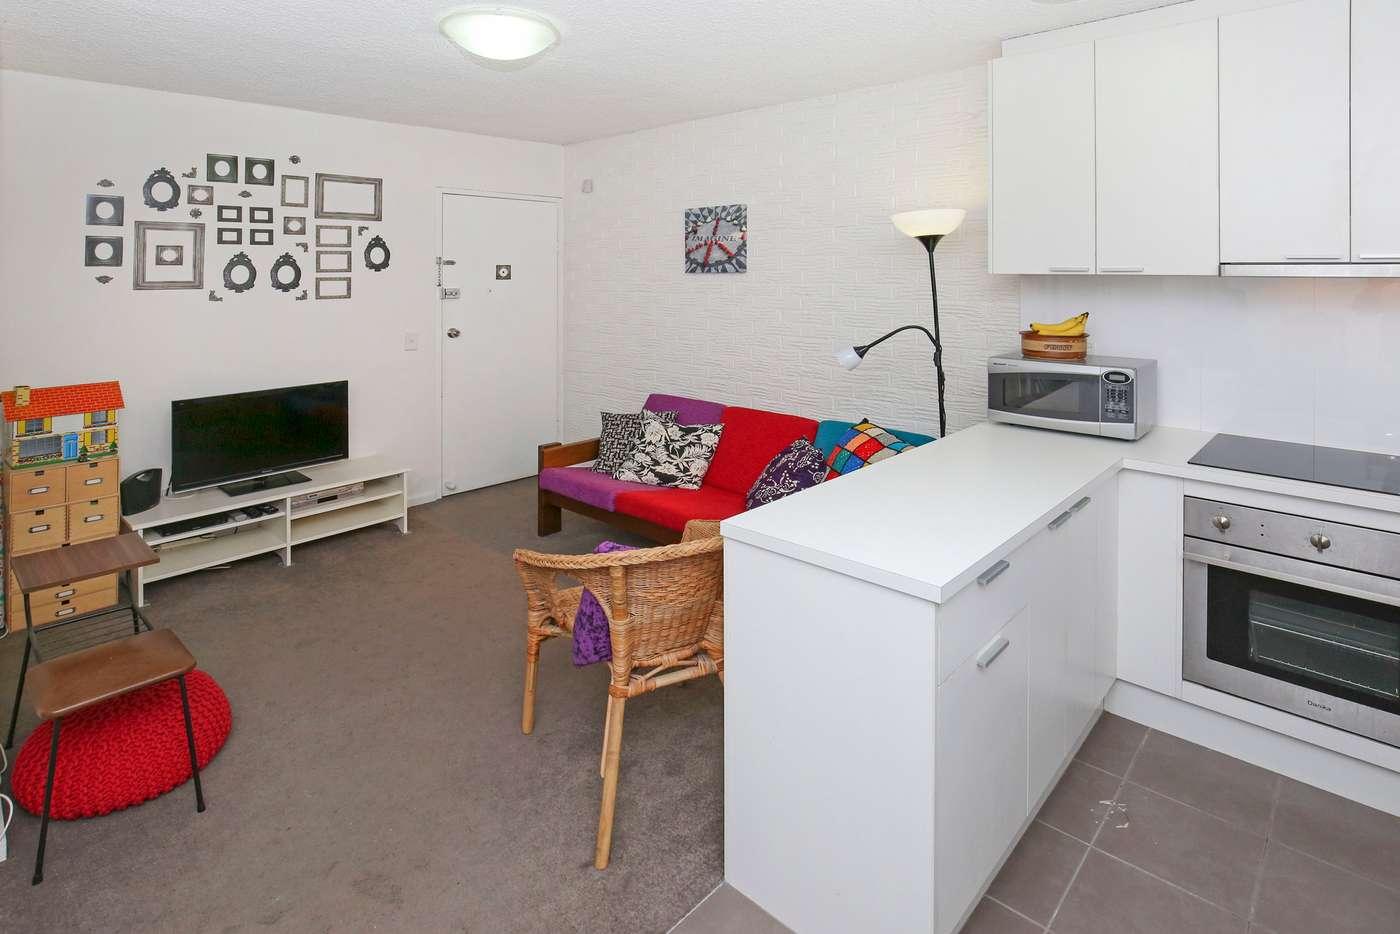 Main view of Homely apartment listing, 6/62 Dundas Street, Thornbury VIC 3071